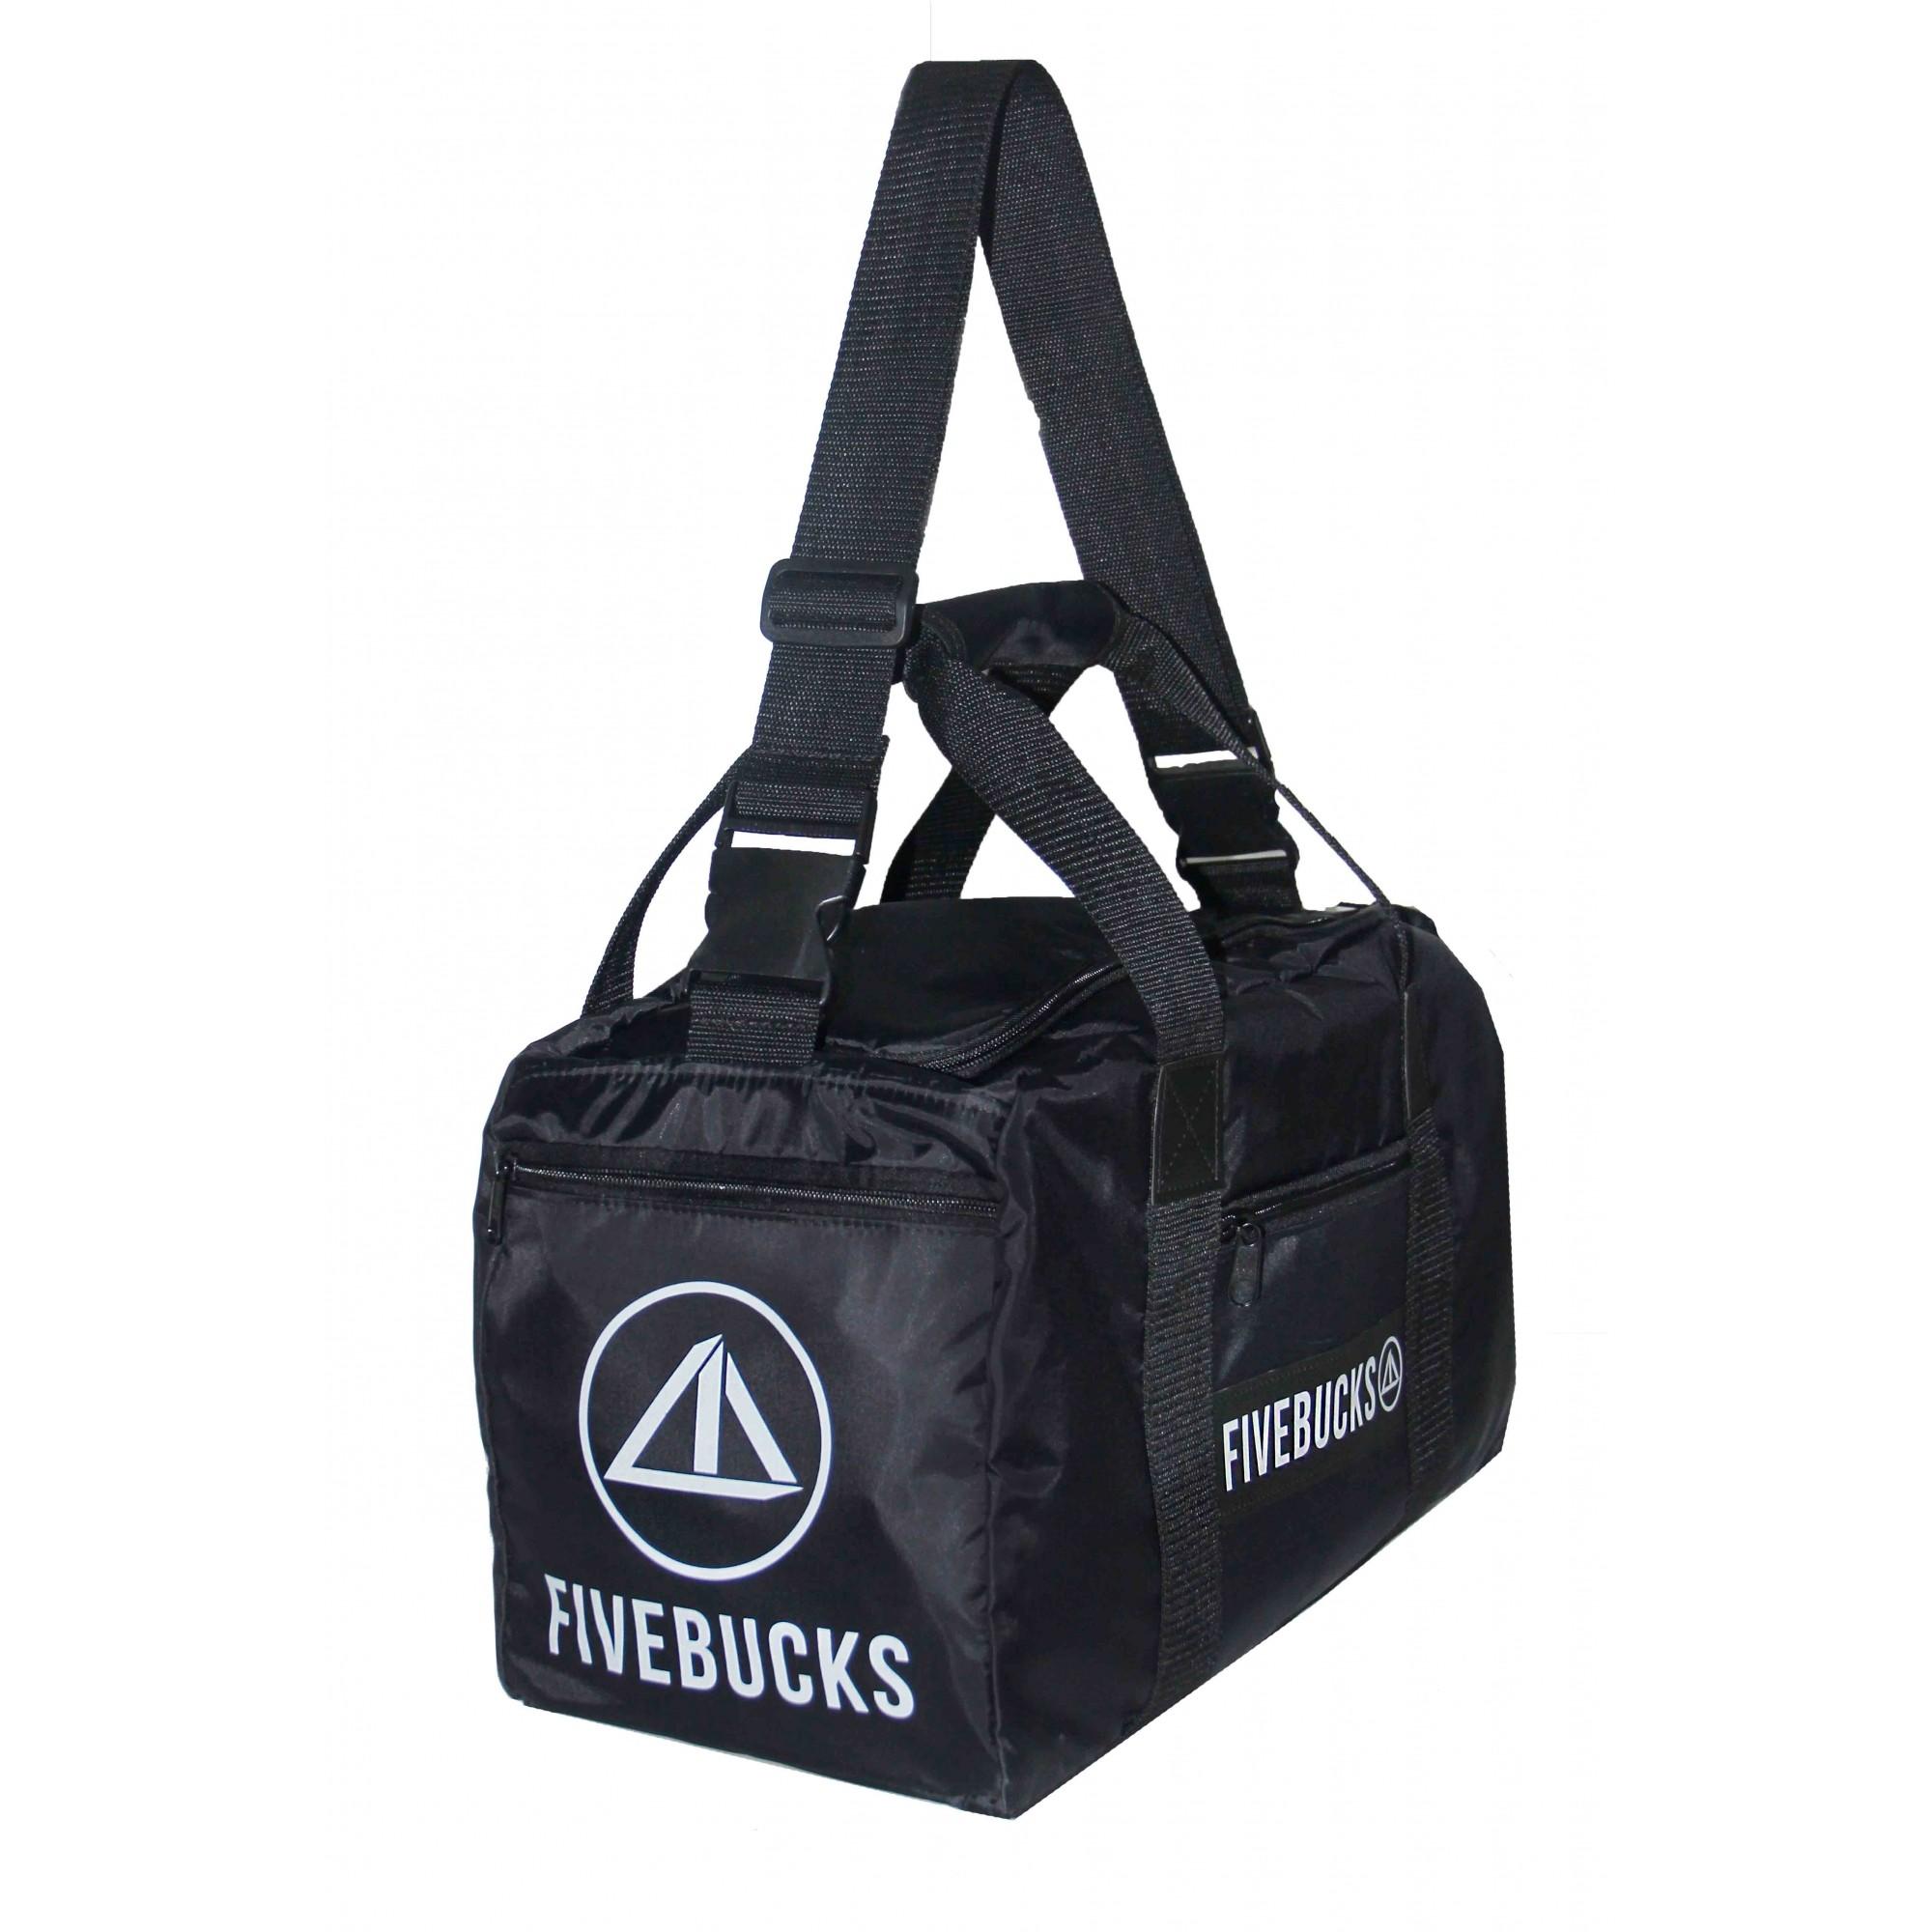 Travel Bag FiveBucks